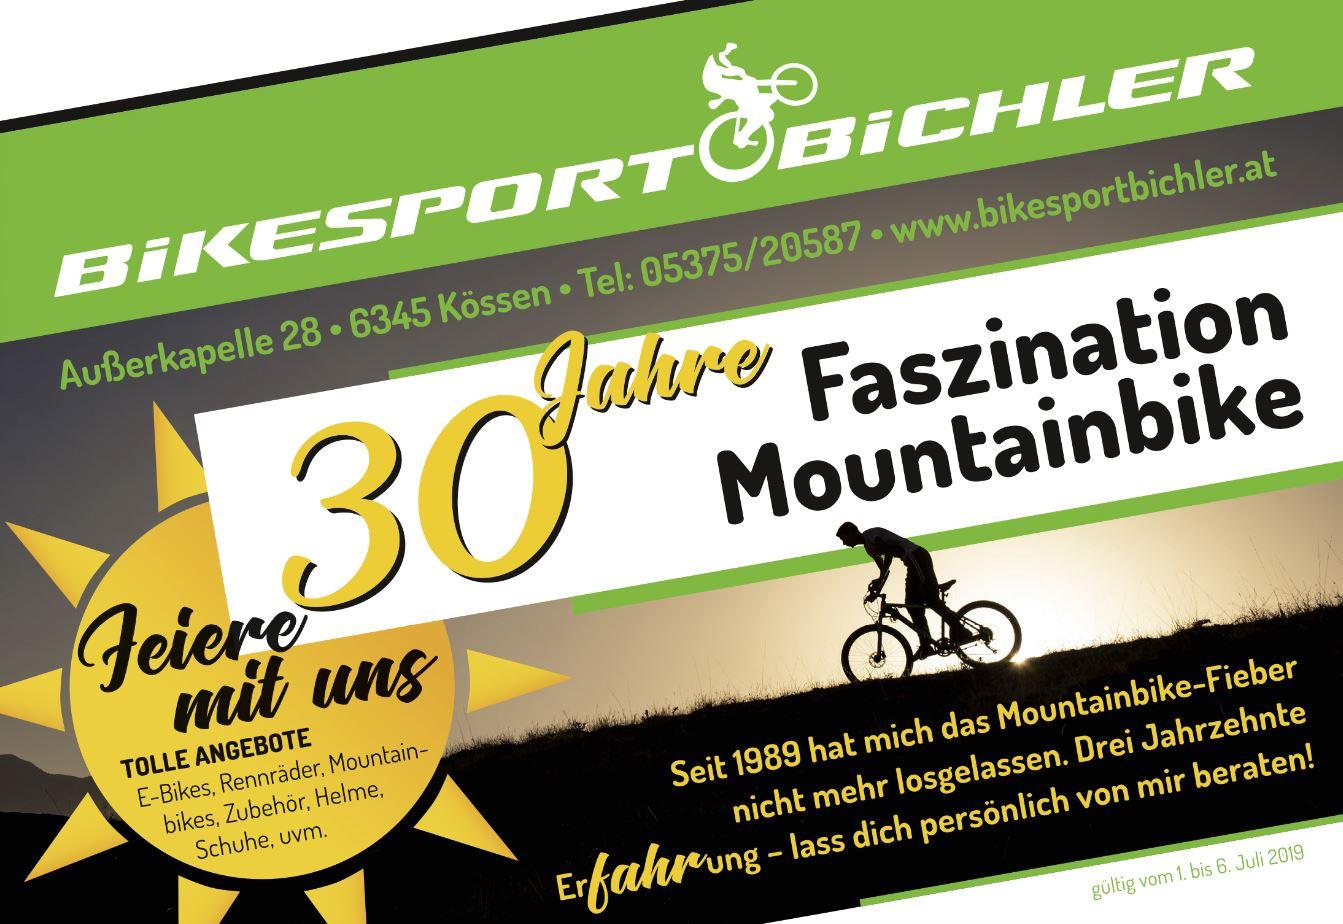 bikesportpichler-juni-2019